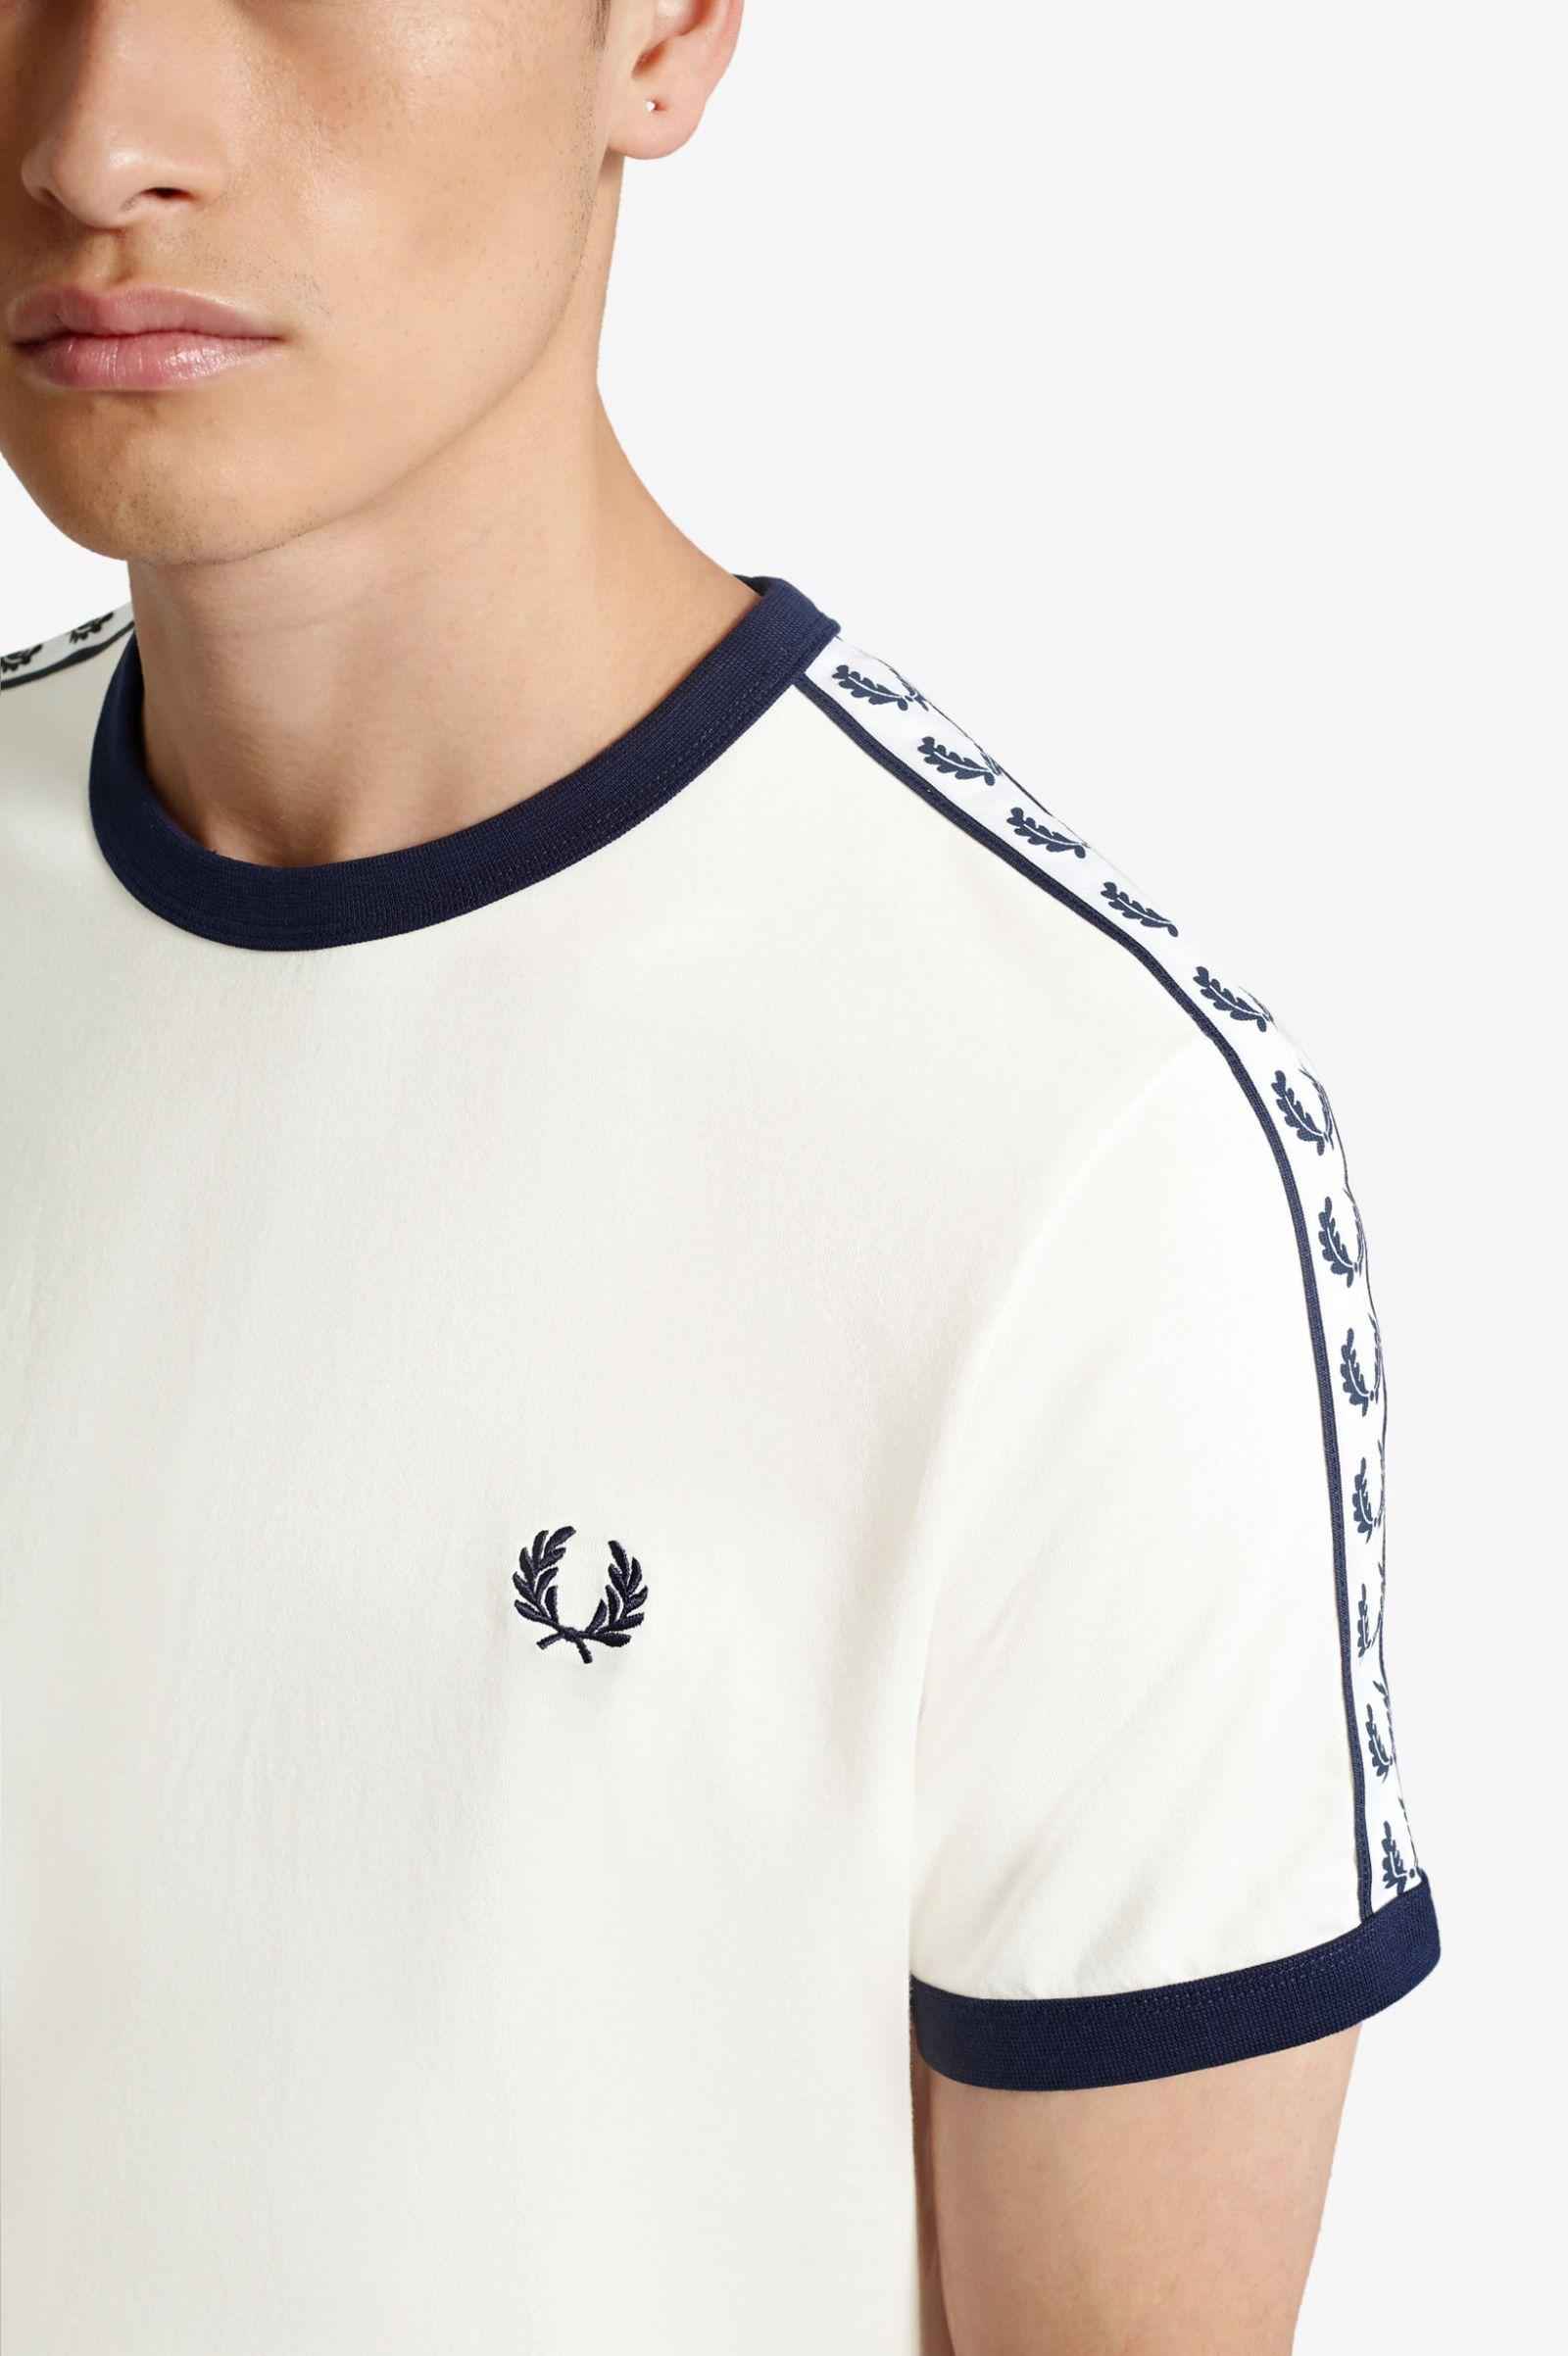 Camiseta Ringer Con Cinta Blanco Nieve   Camisas Para